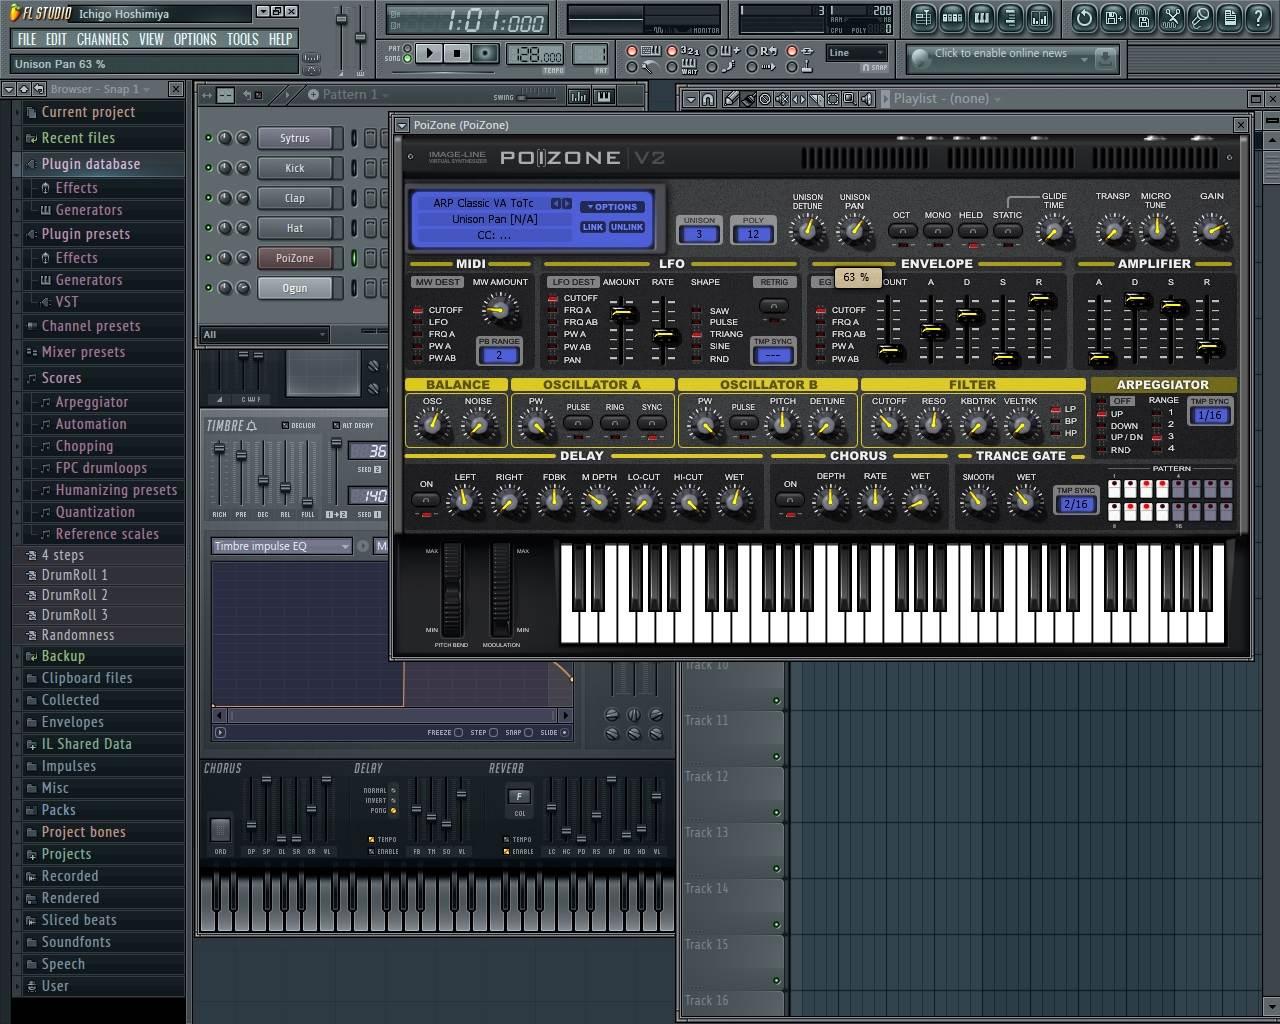 fruity loops studio for mac free download